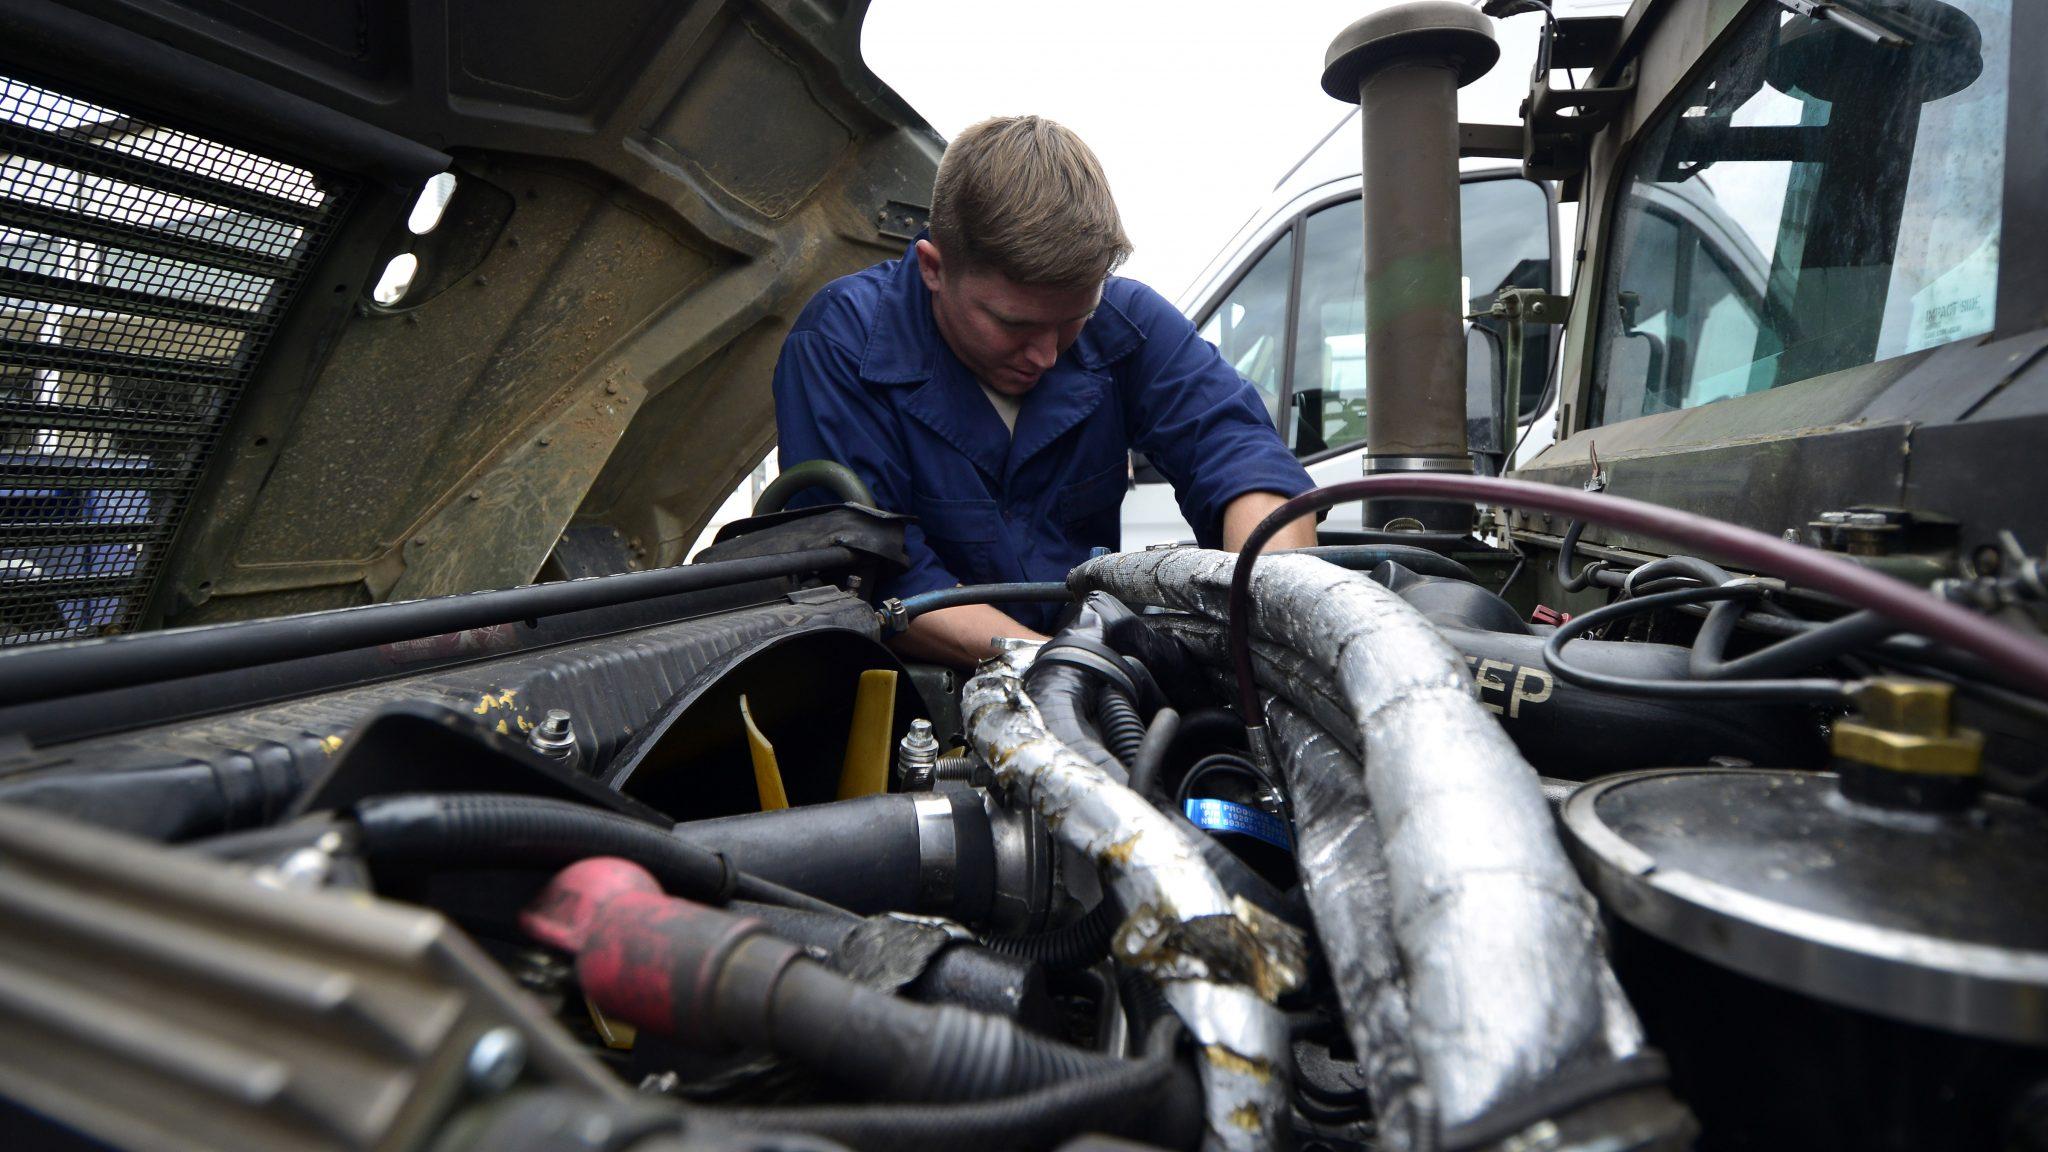 Automotive service technicians, truck and bus mechanics and mechanical repairers